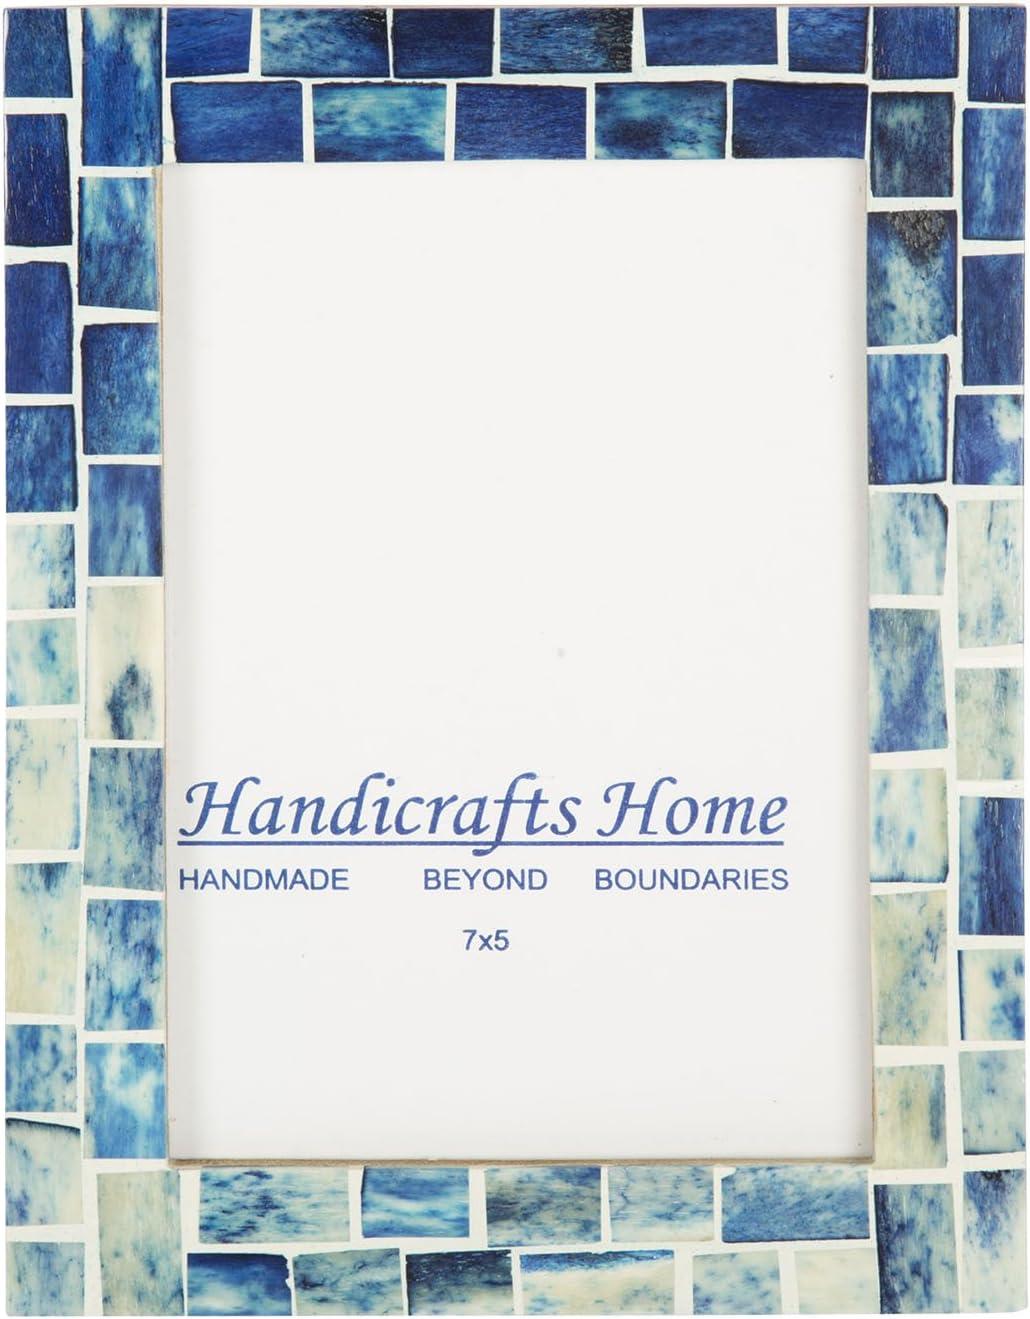 Handicrafts Home Indigo Mosaic Photo Frame Bone Handmade Picture Frames – 5x7 inch